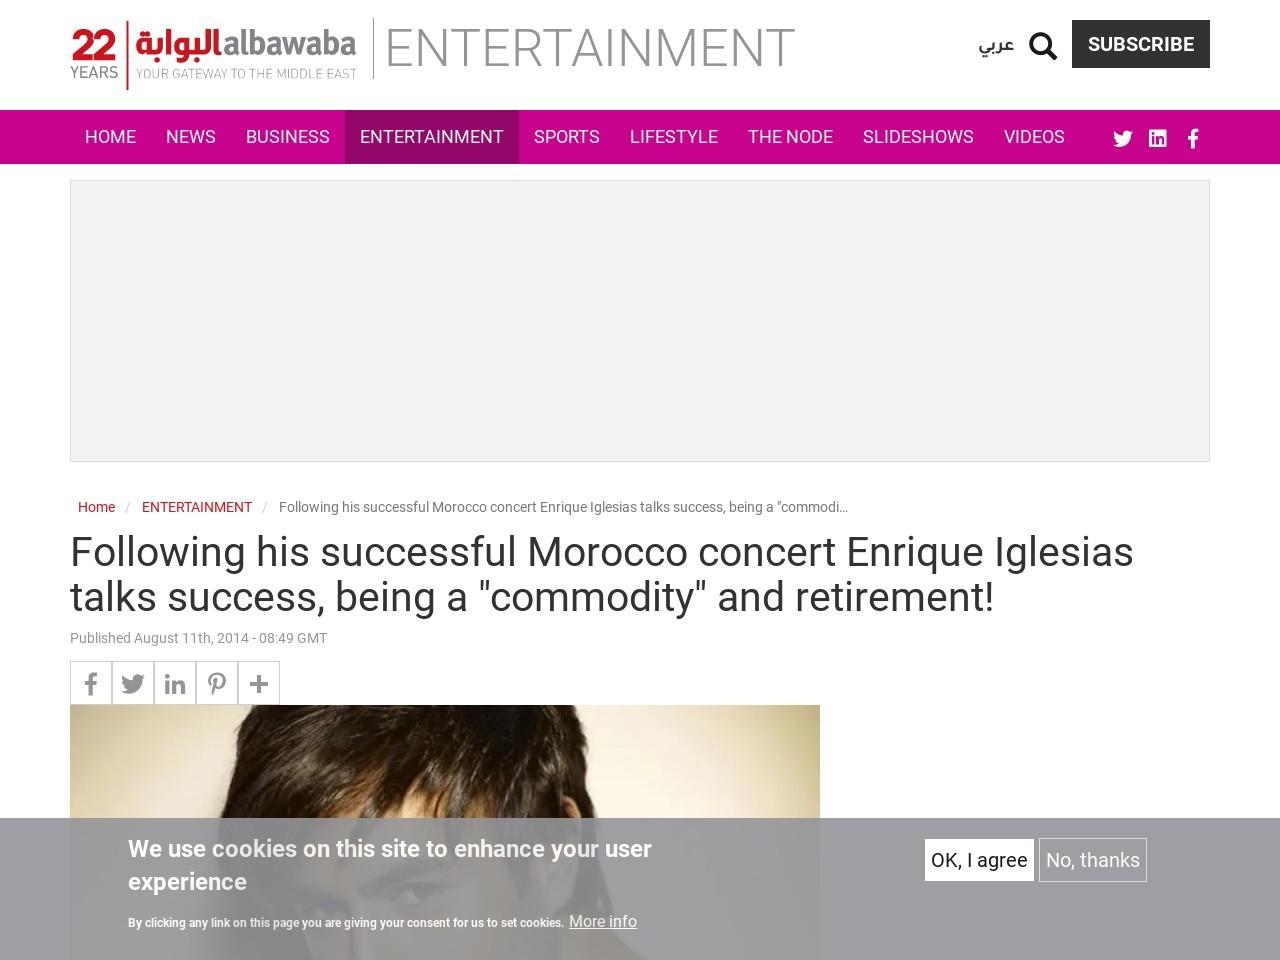 Following His Successful Morocco Concert Enrique Iglesias Talks Success …